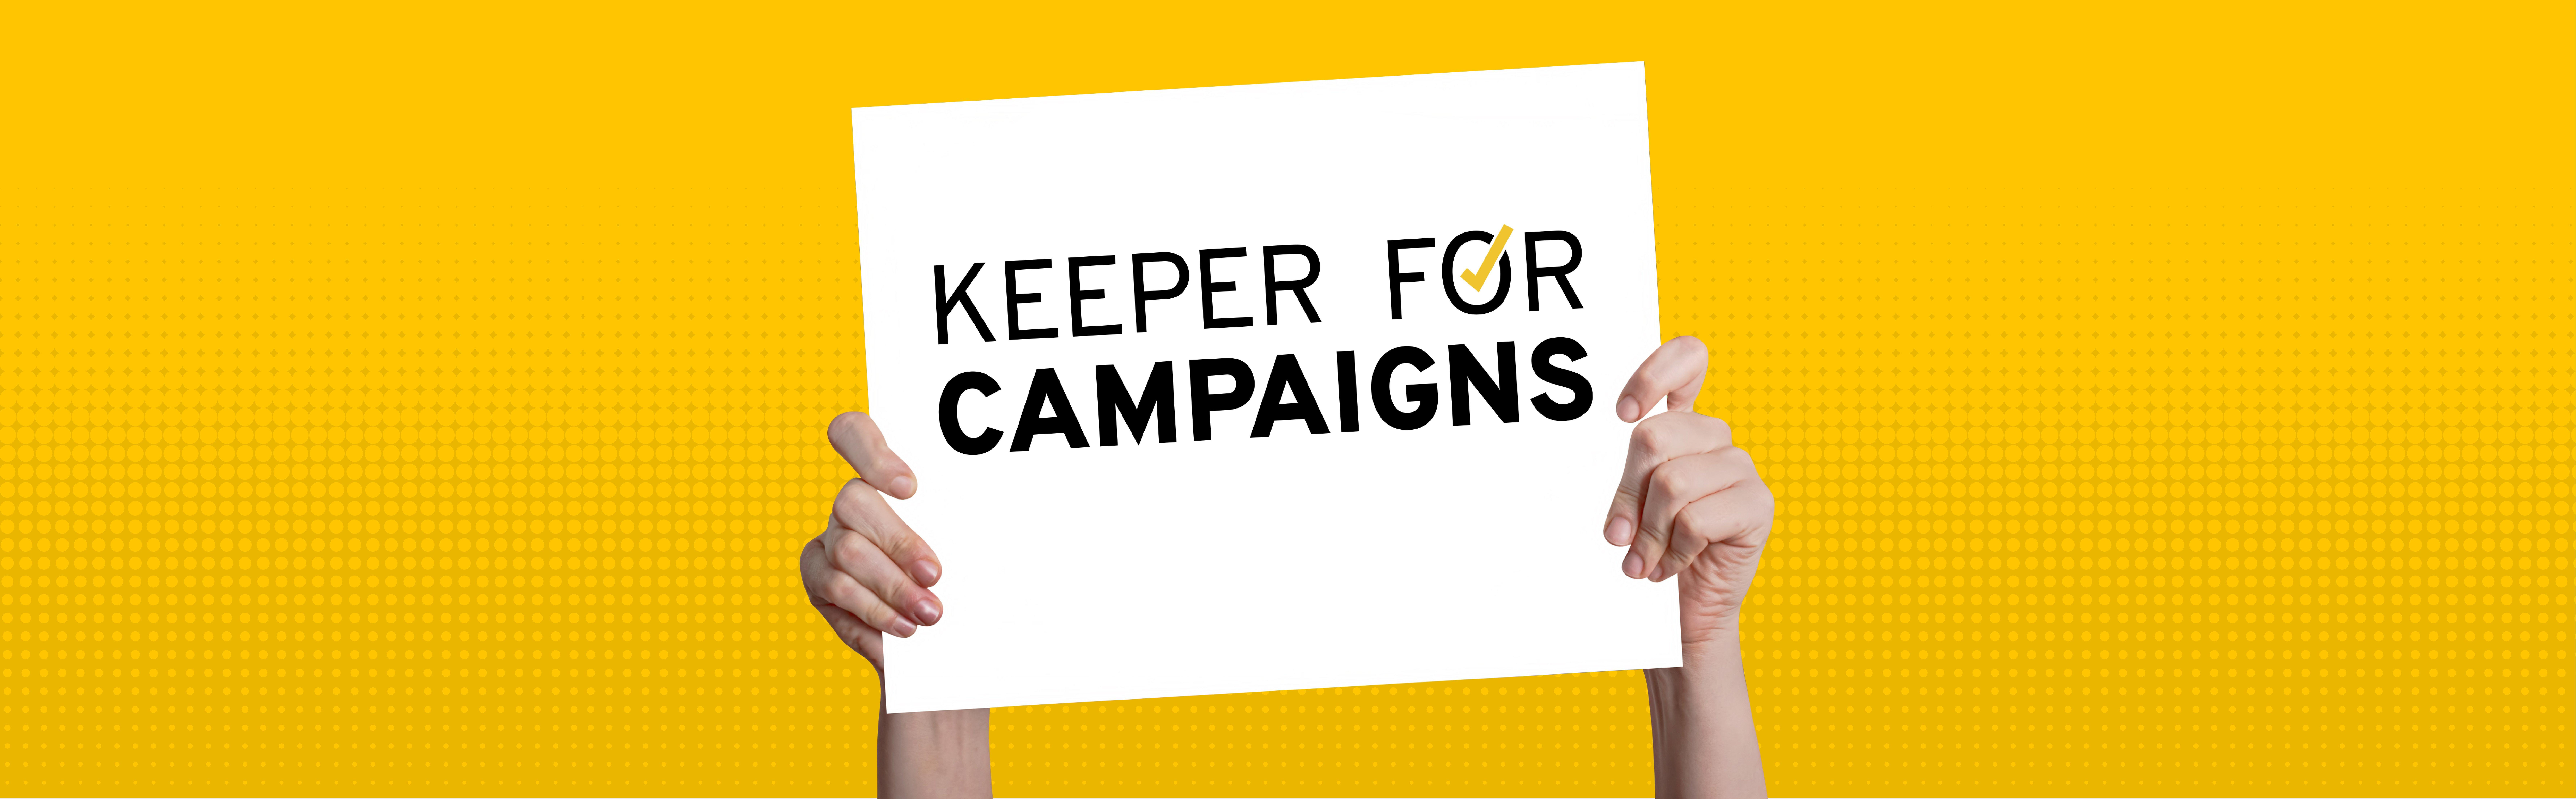 keeper-campaigns-thumbnail (2)